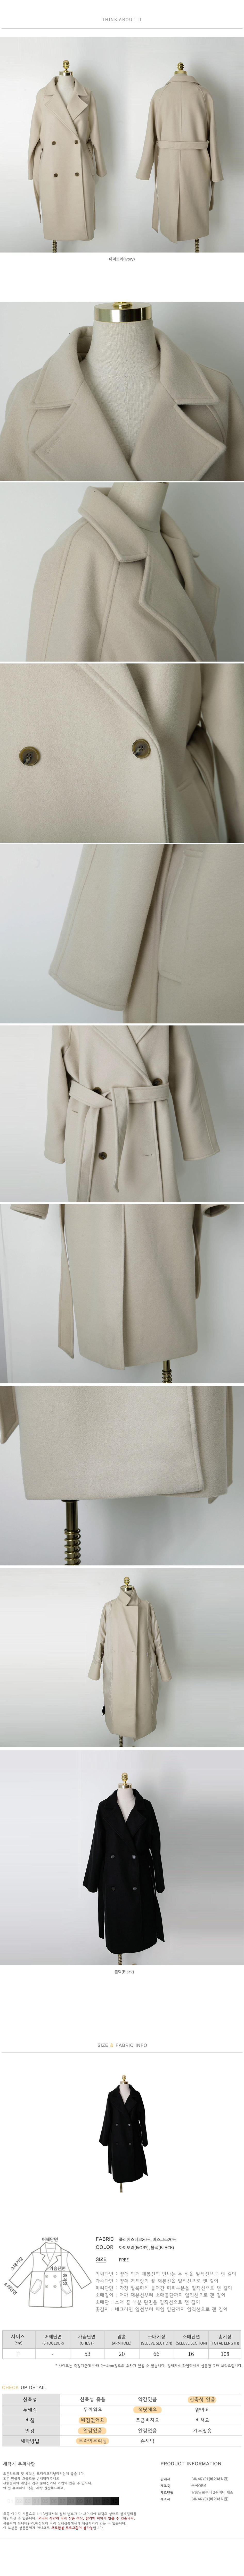 Raglan Photo Double Coat